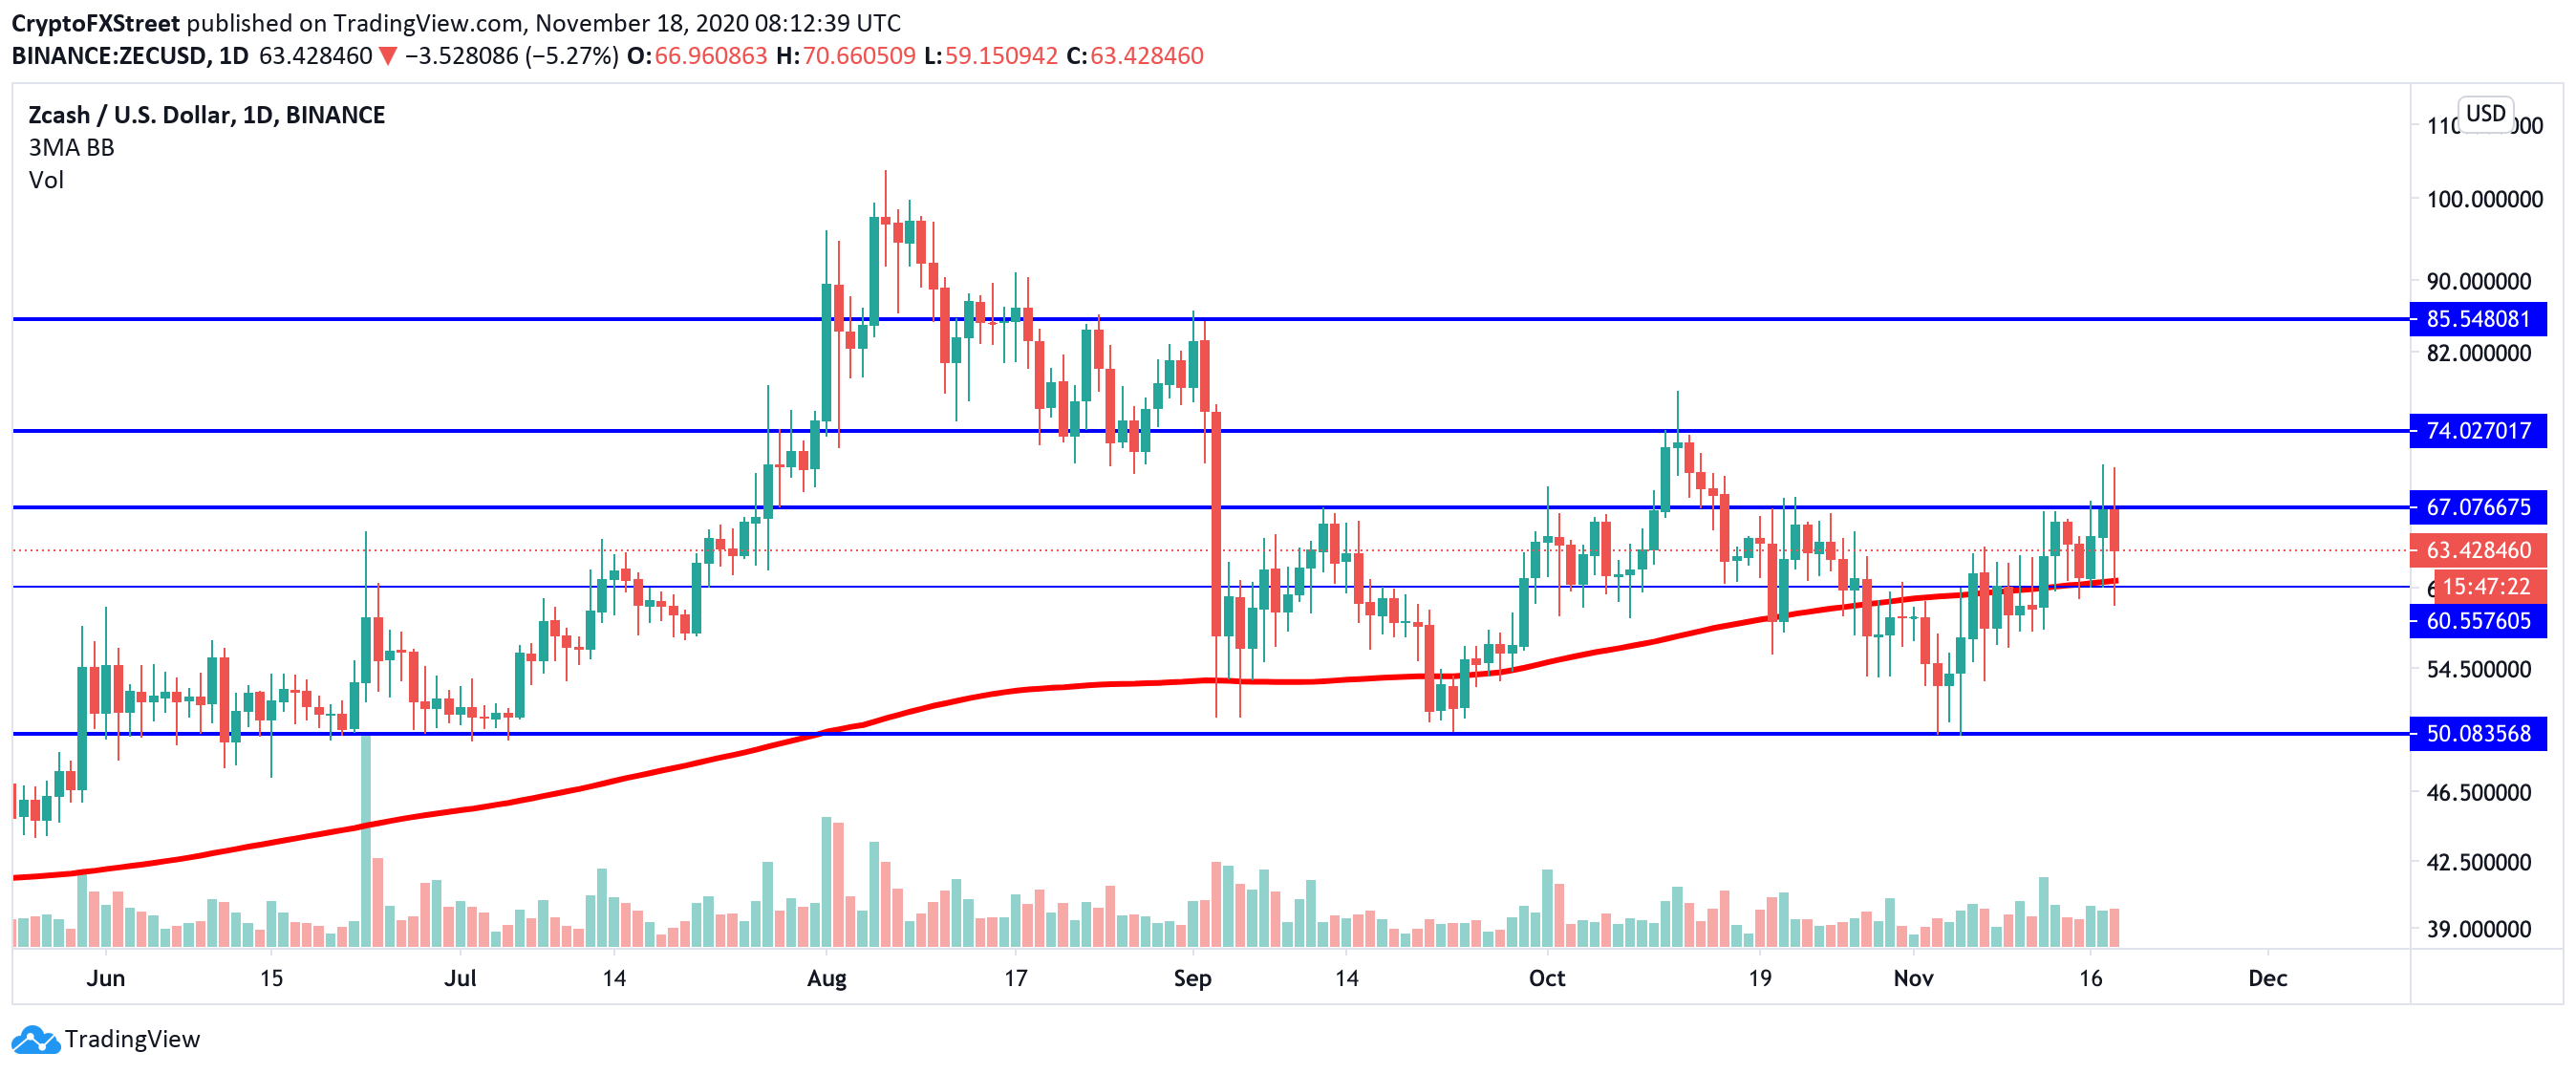 ZEC/USD daily chart